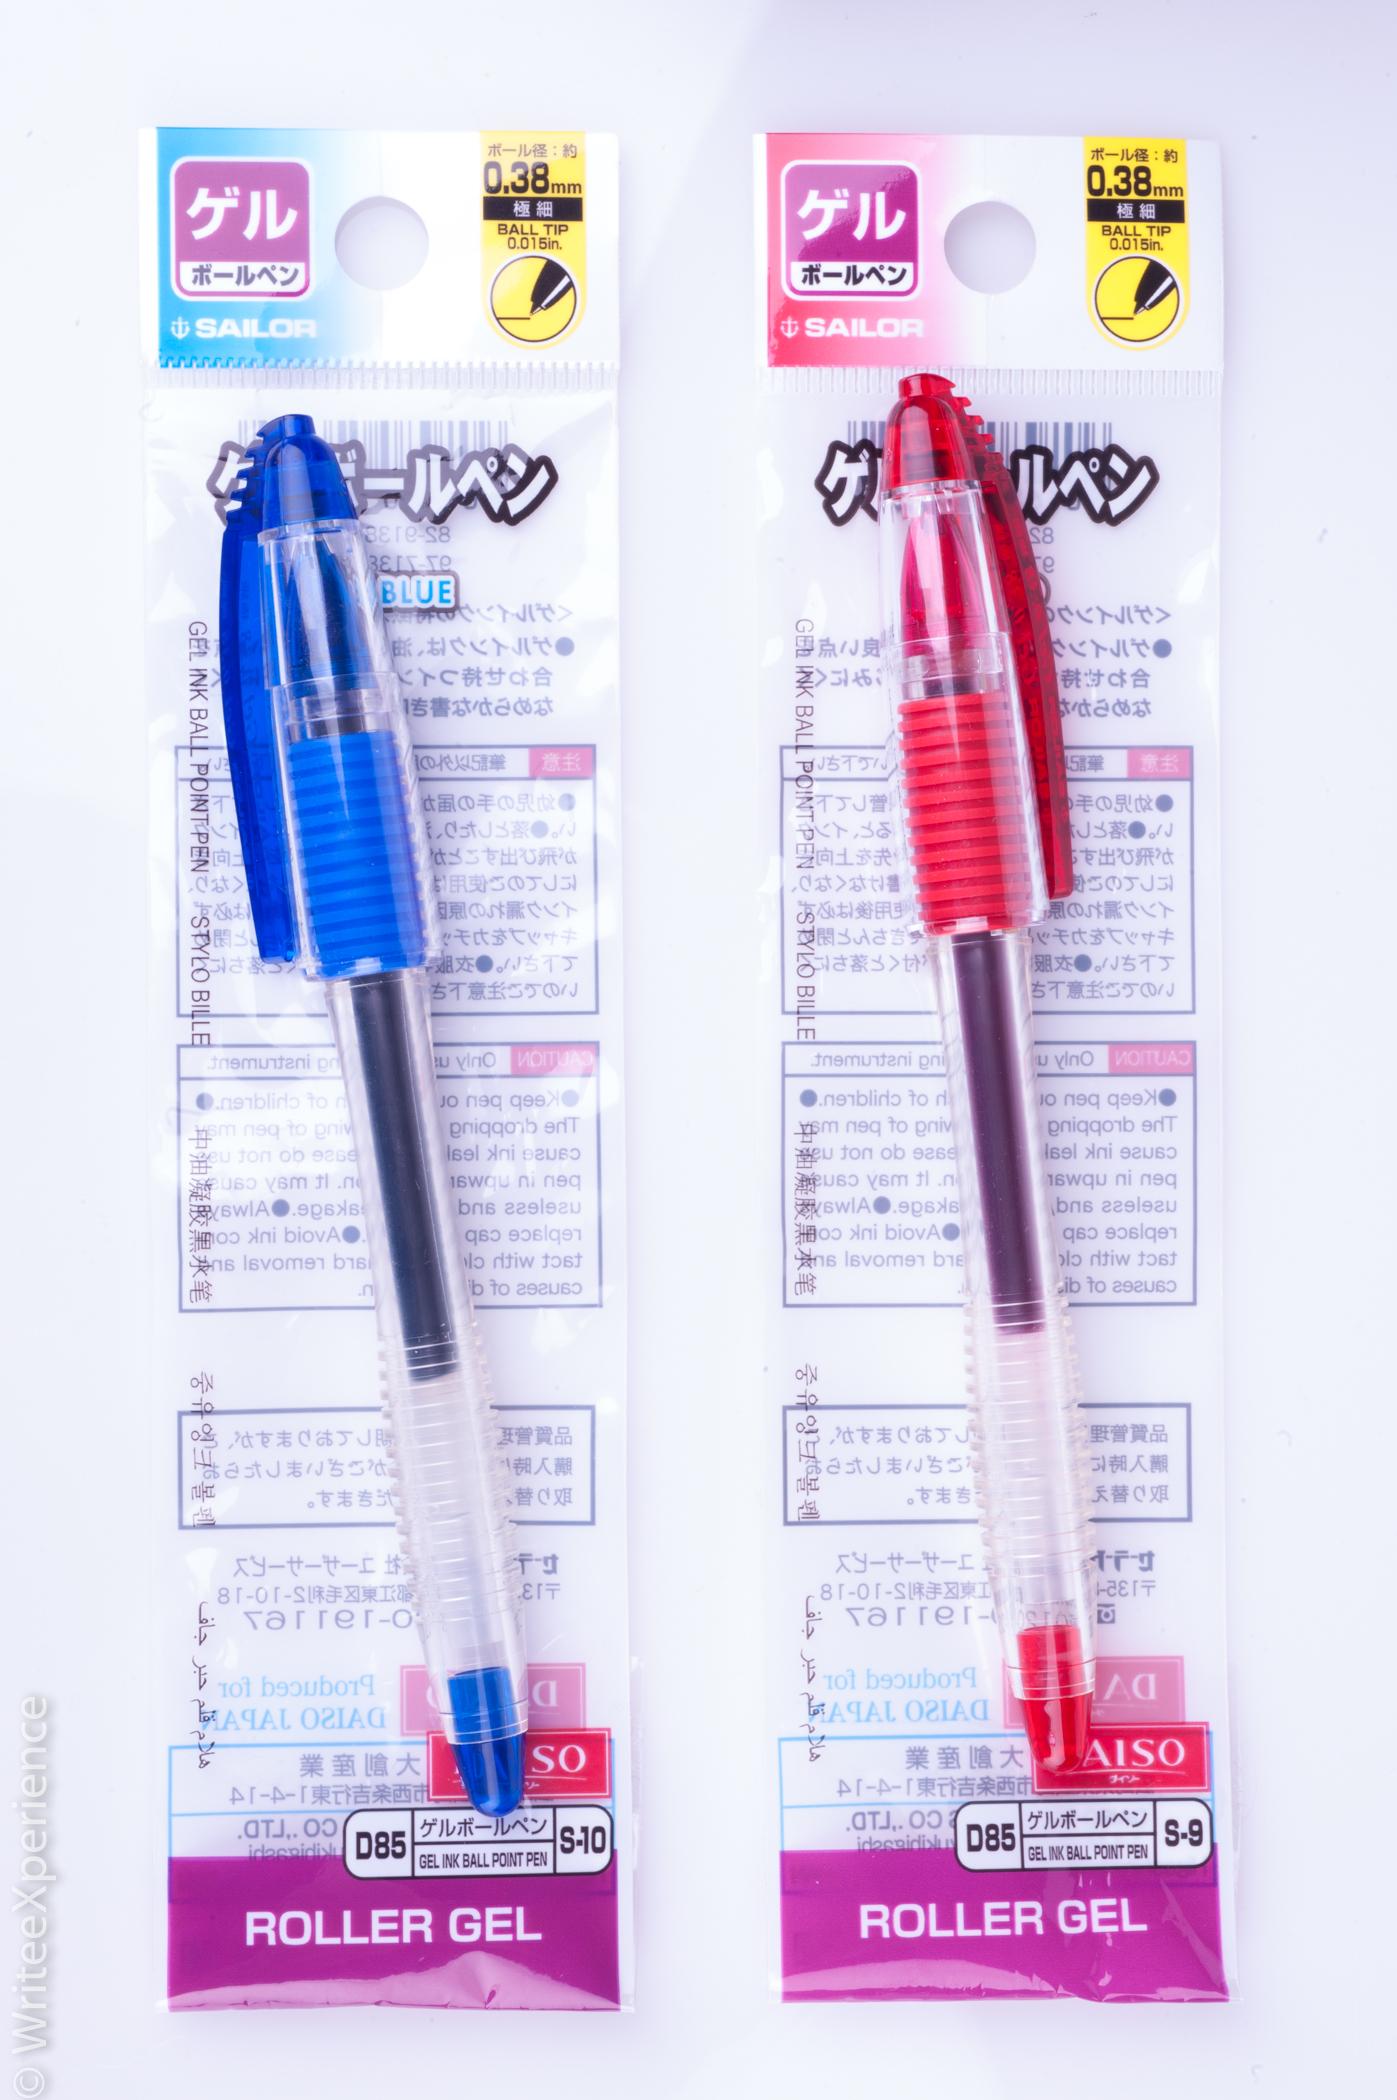 WriteeXperience-Daiso-Sailor-Roller-Gel-0.38mm